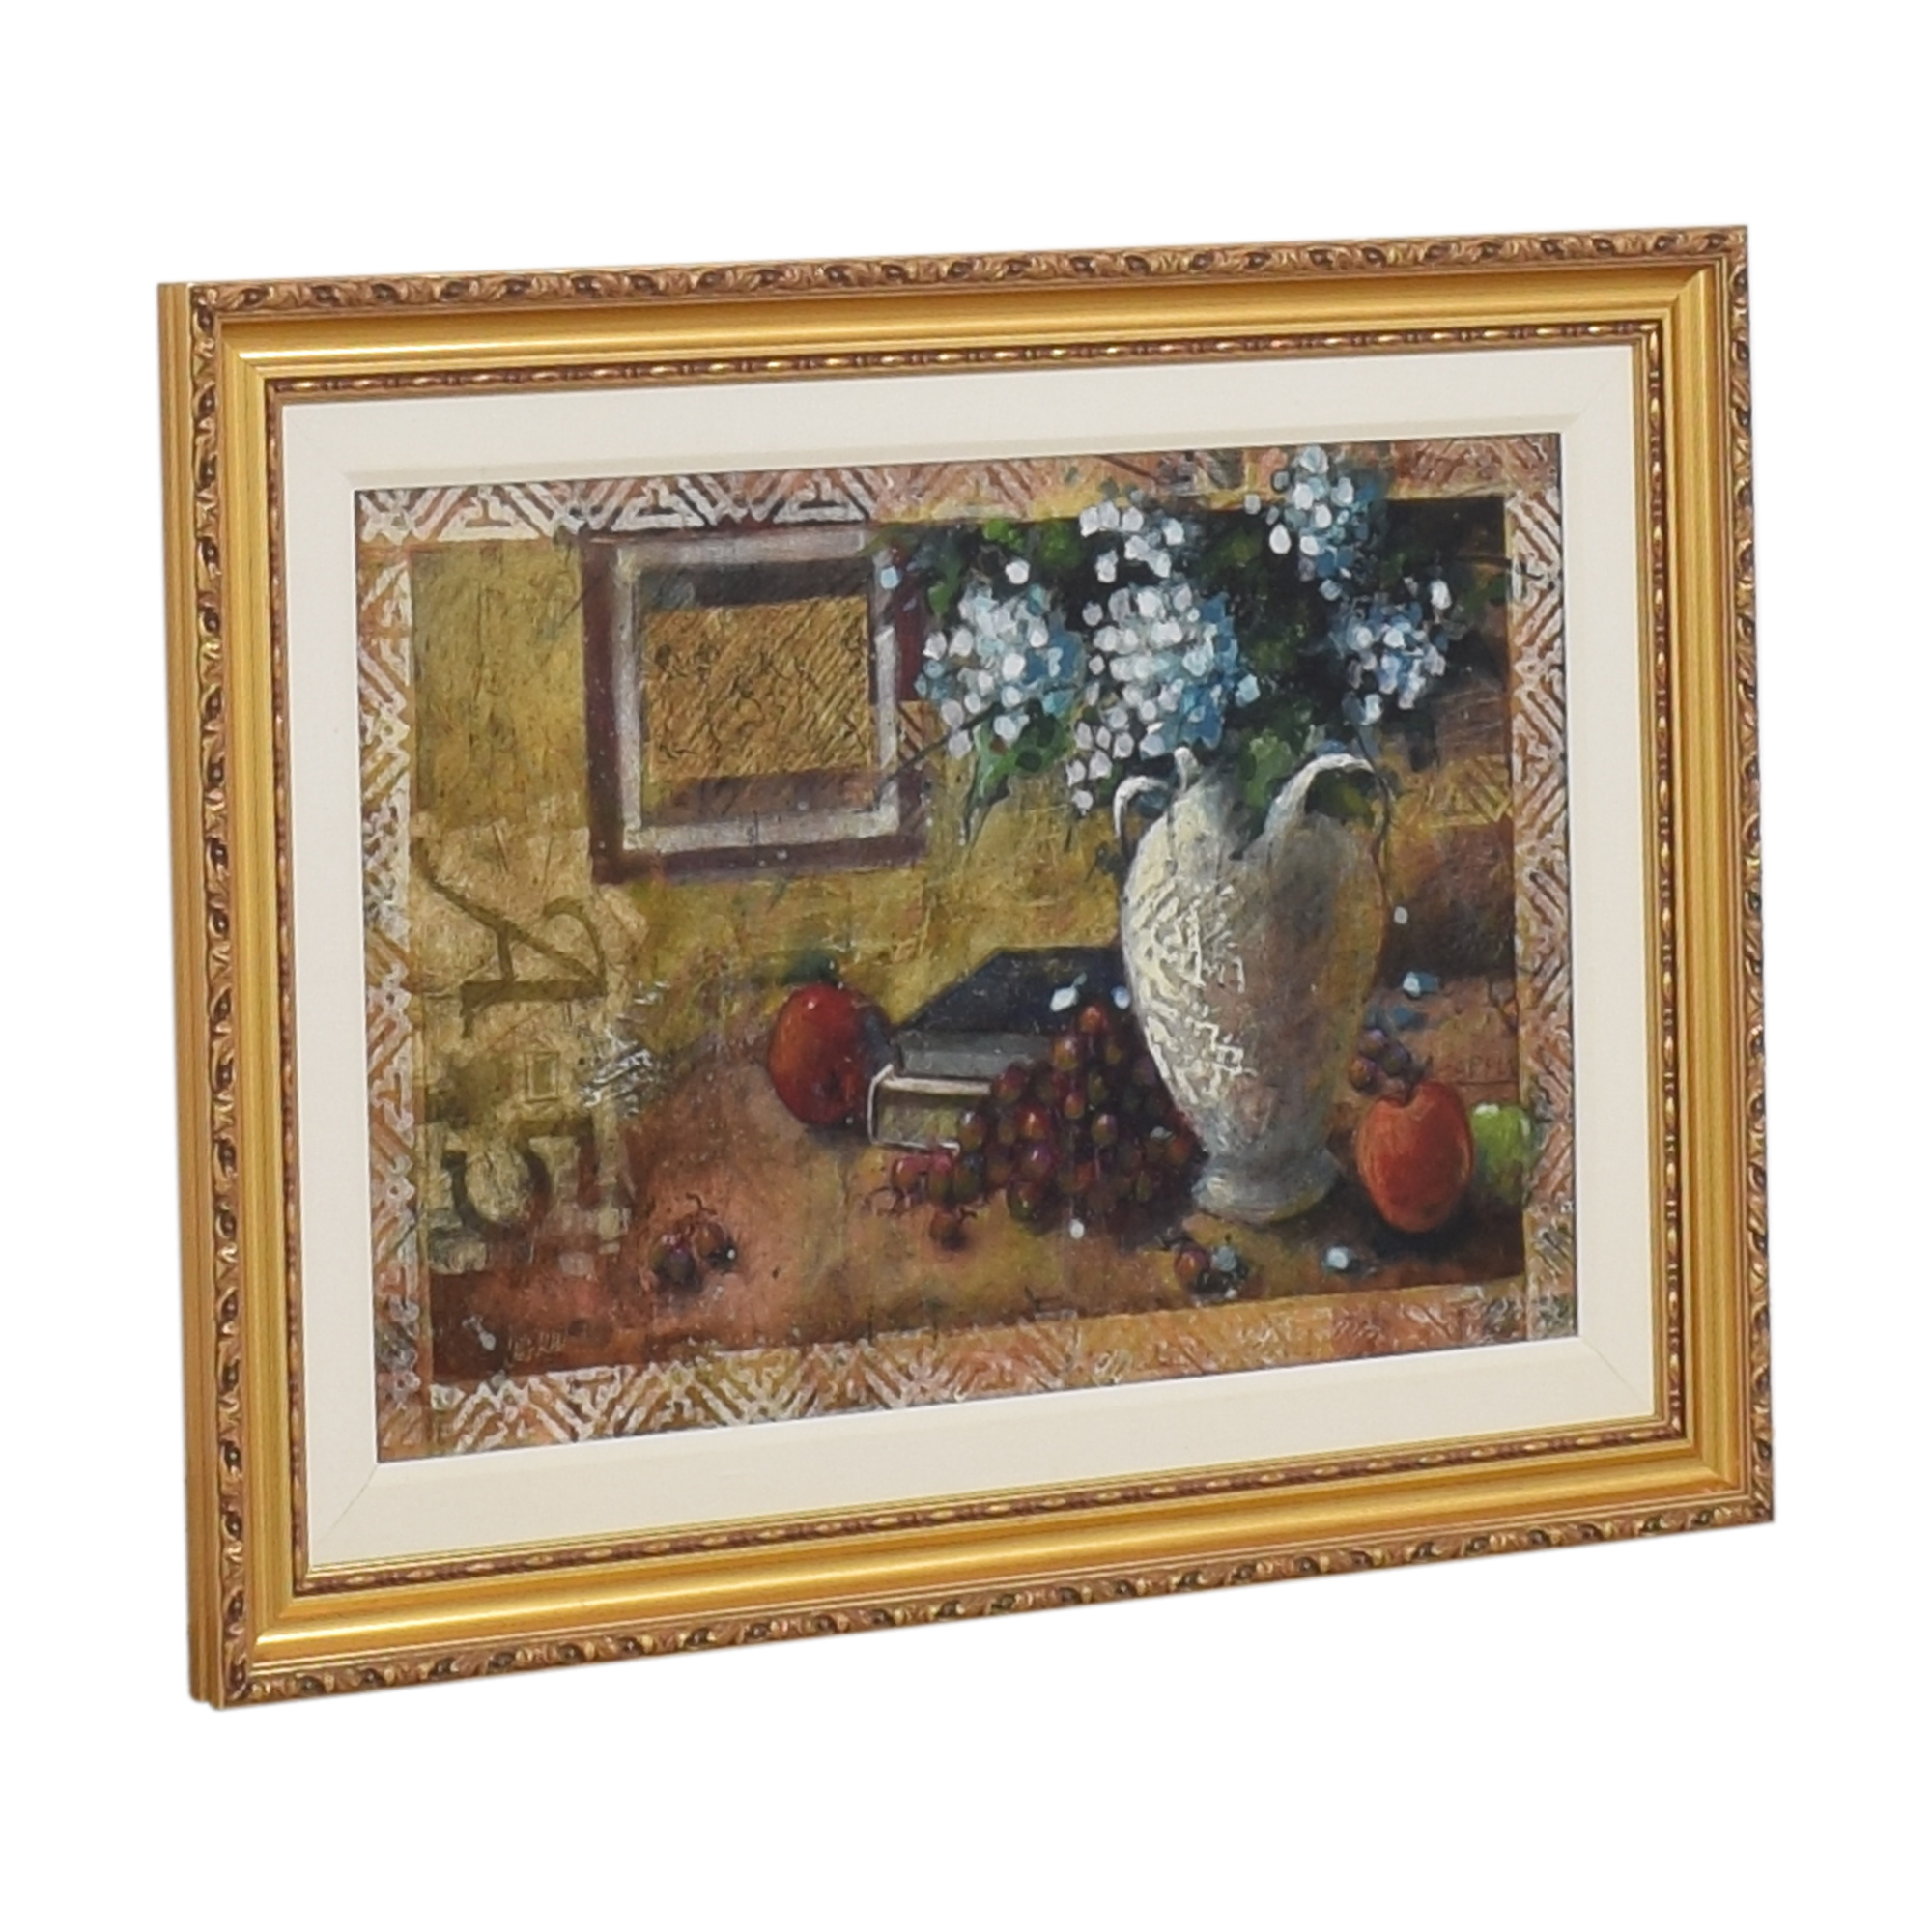 Craig Alan Framed Print price